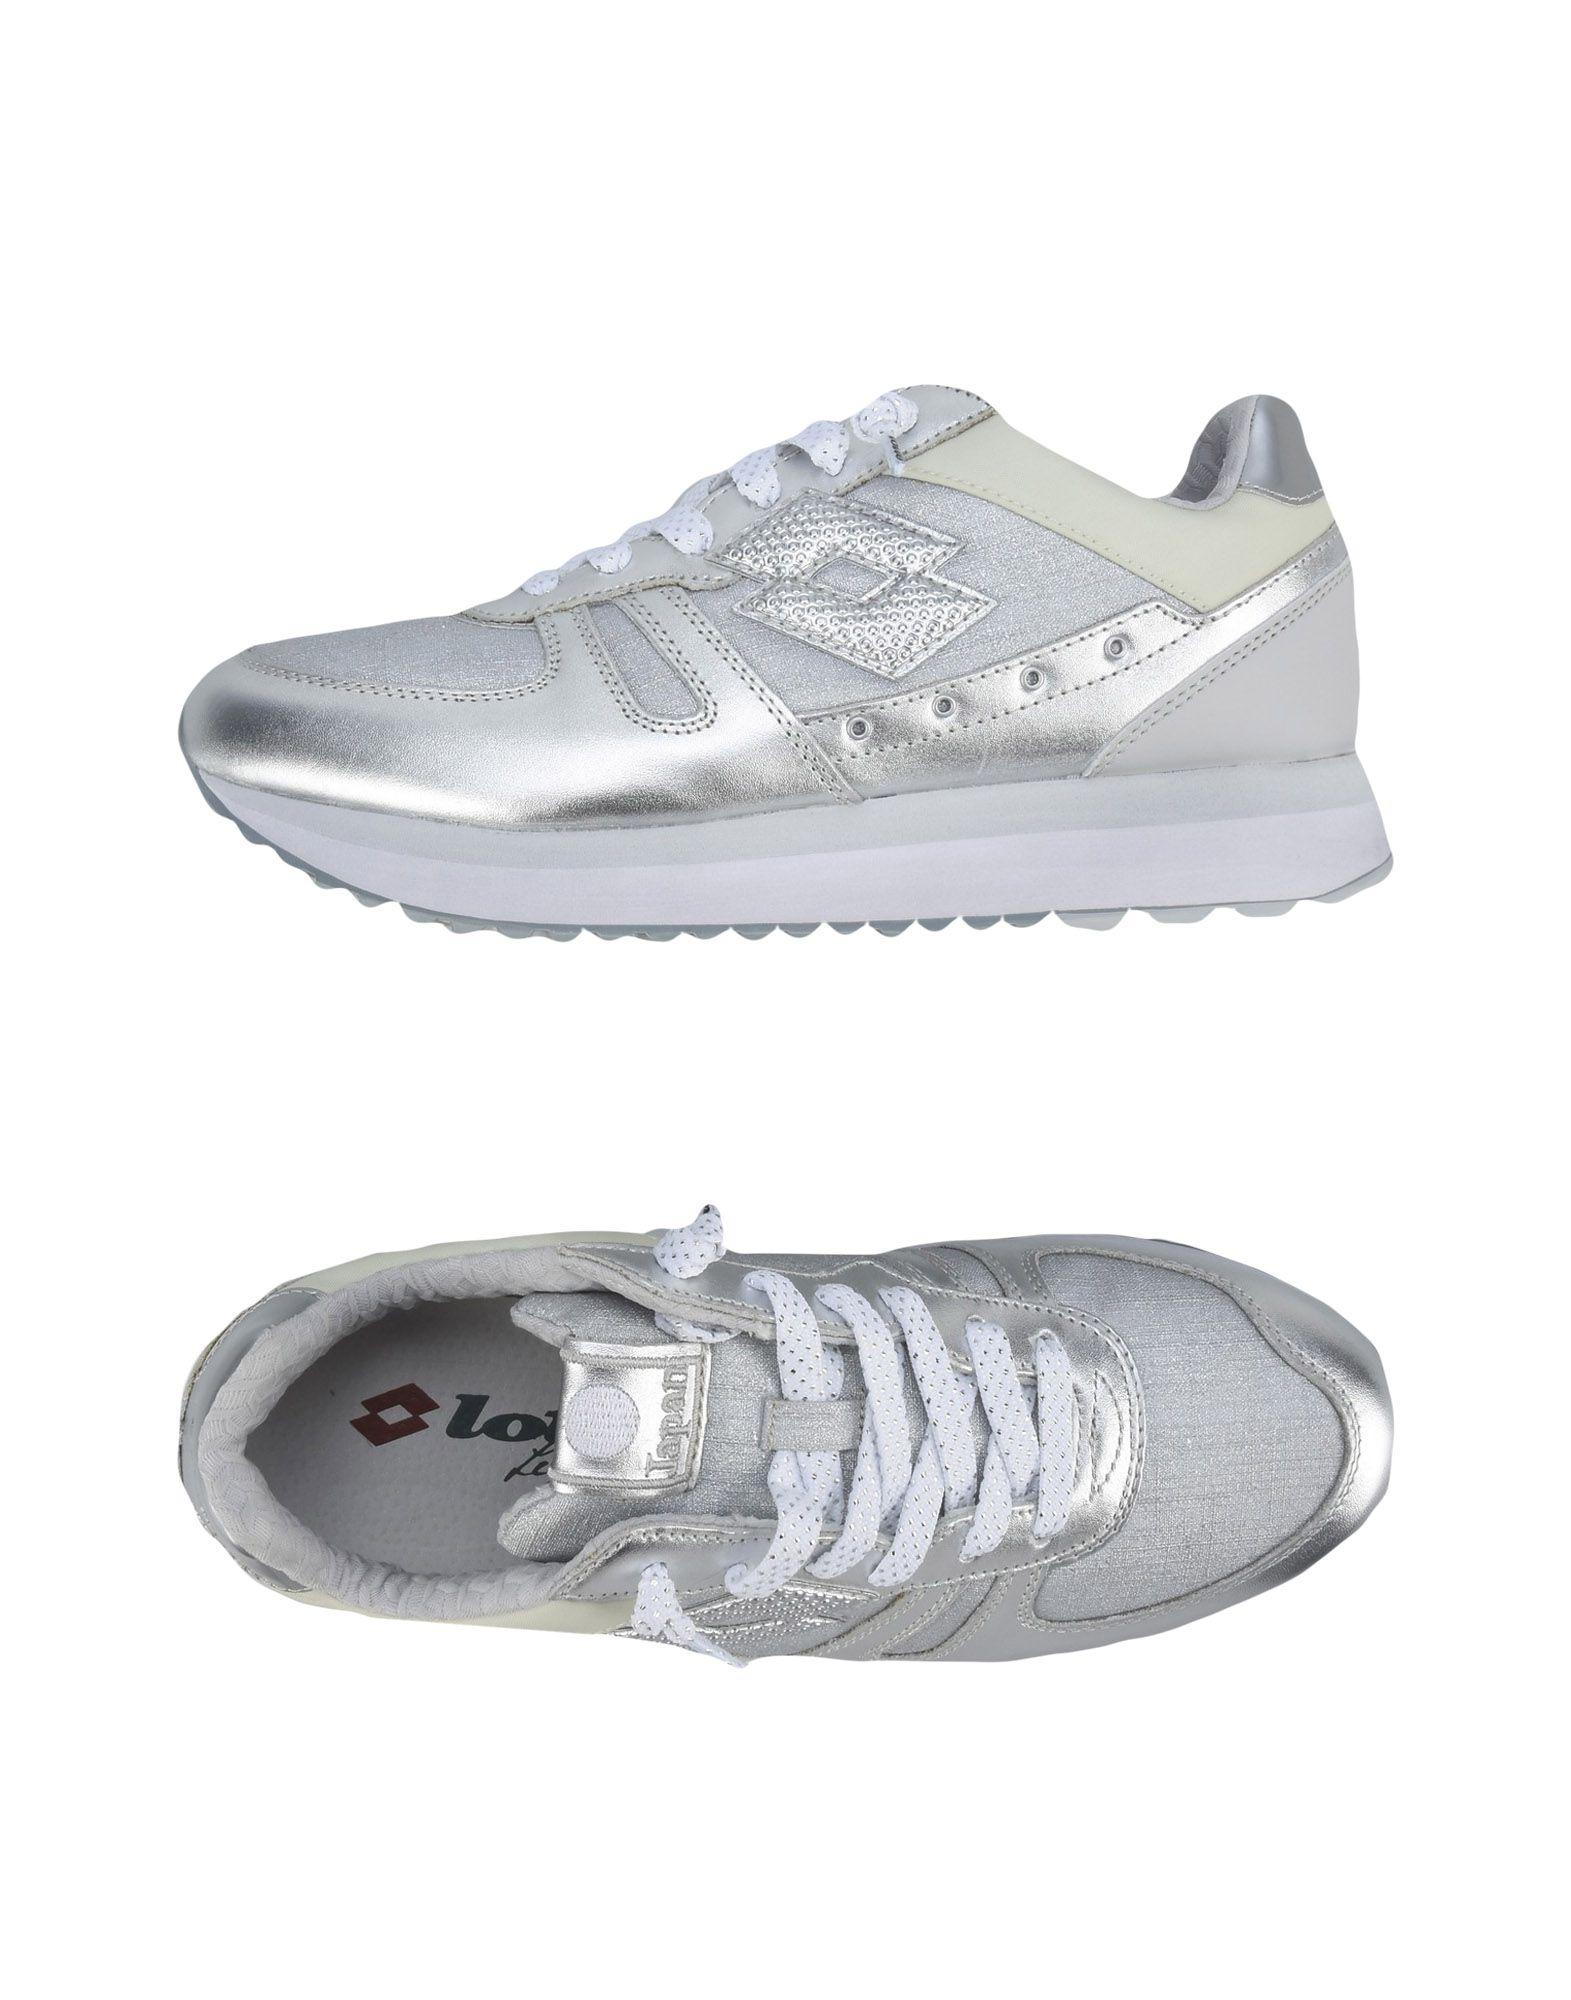 Sneakers Lotto Leggenda  Tokyo Wedge W - Donna - 11222007KT